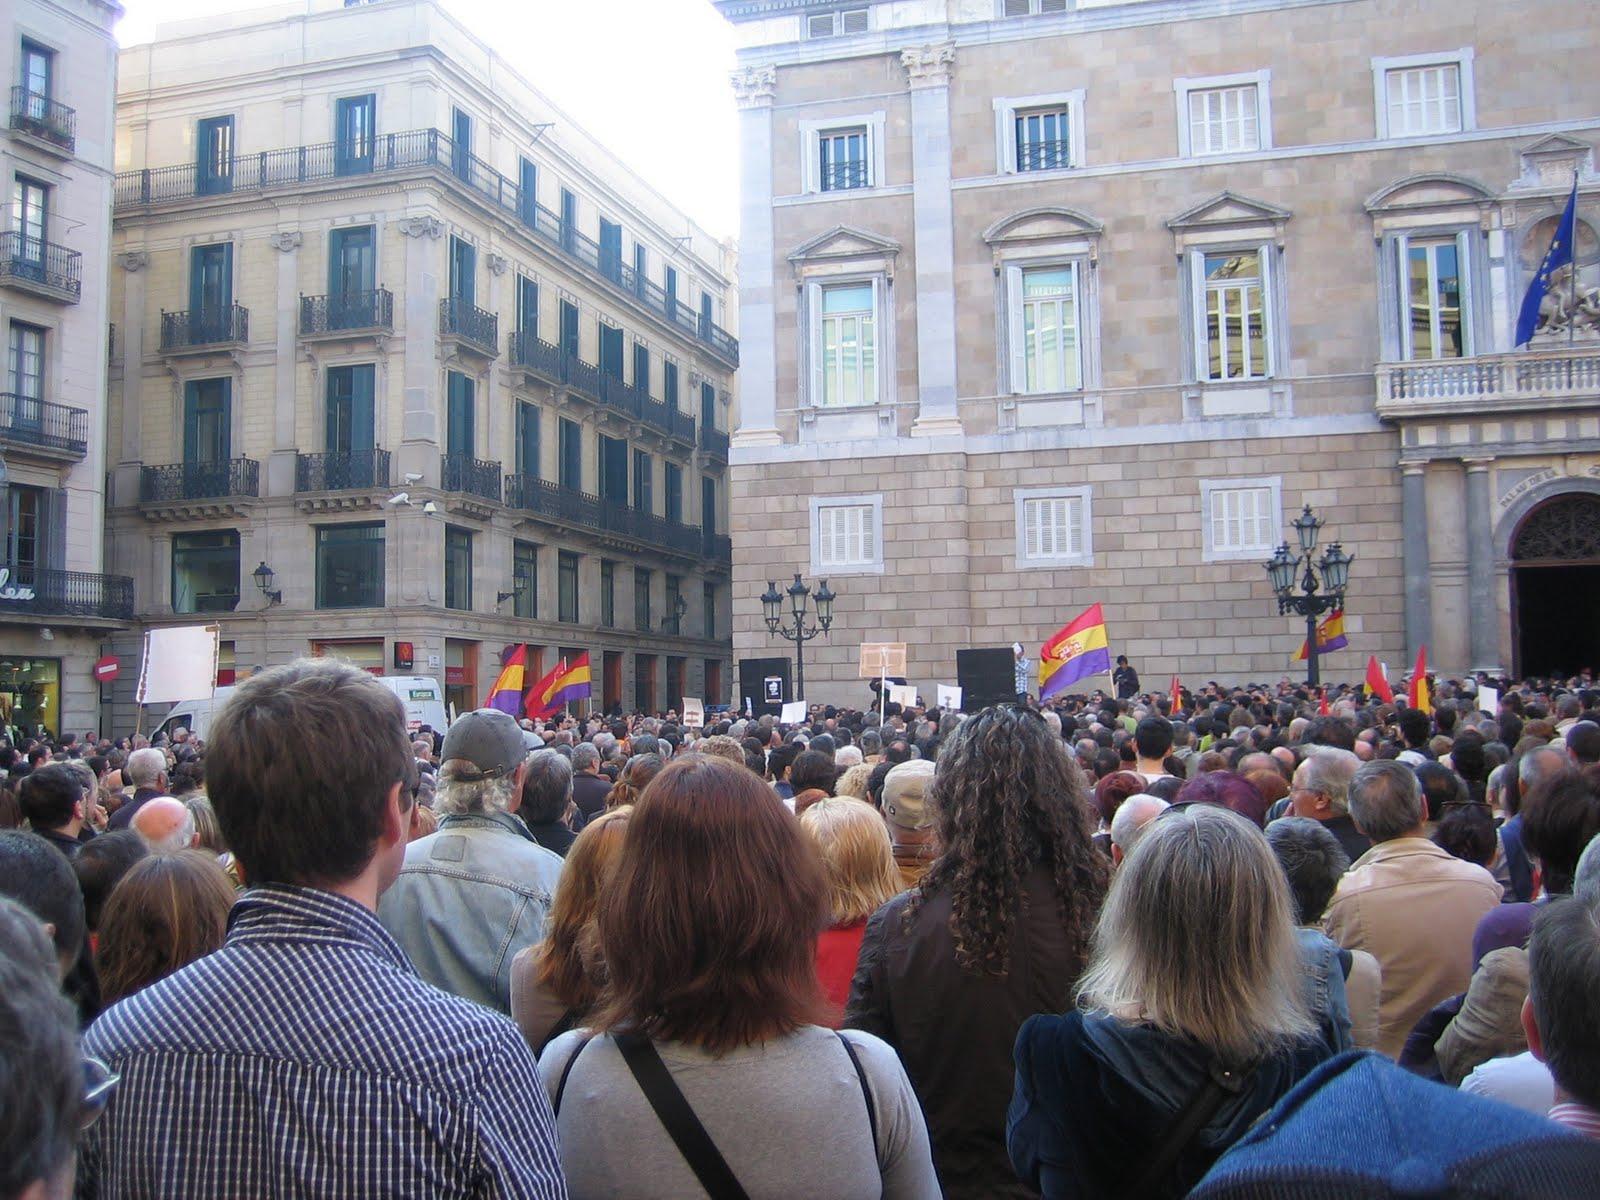 Concentració a plaça Sant Jaume de Barcelona 24 d'abril de 2010